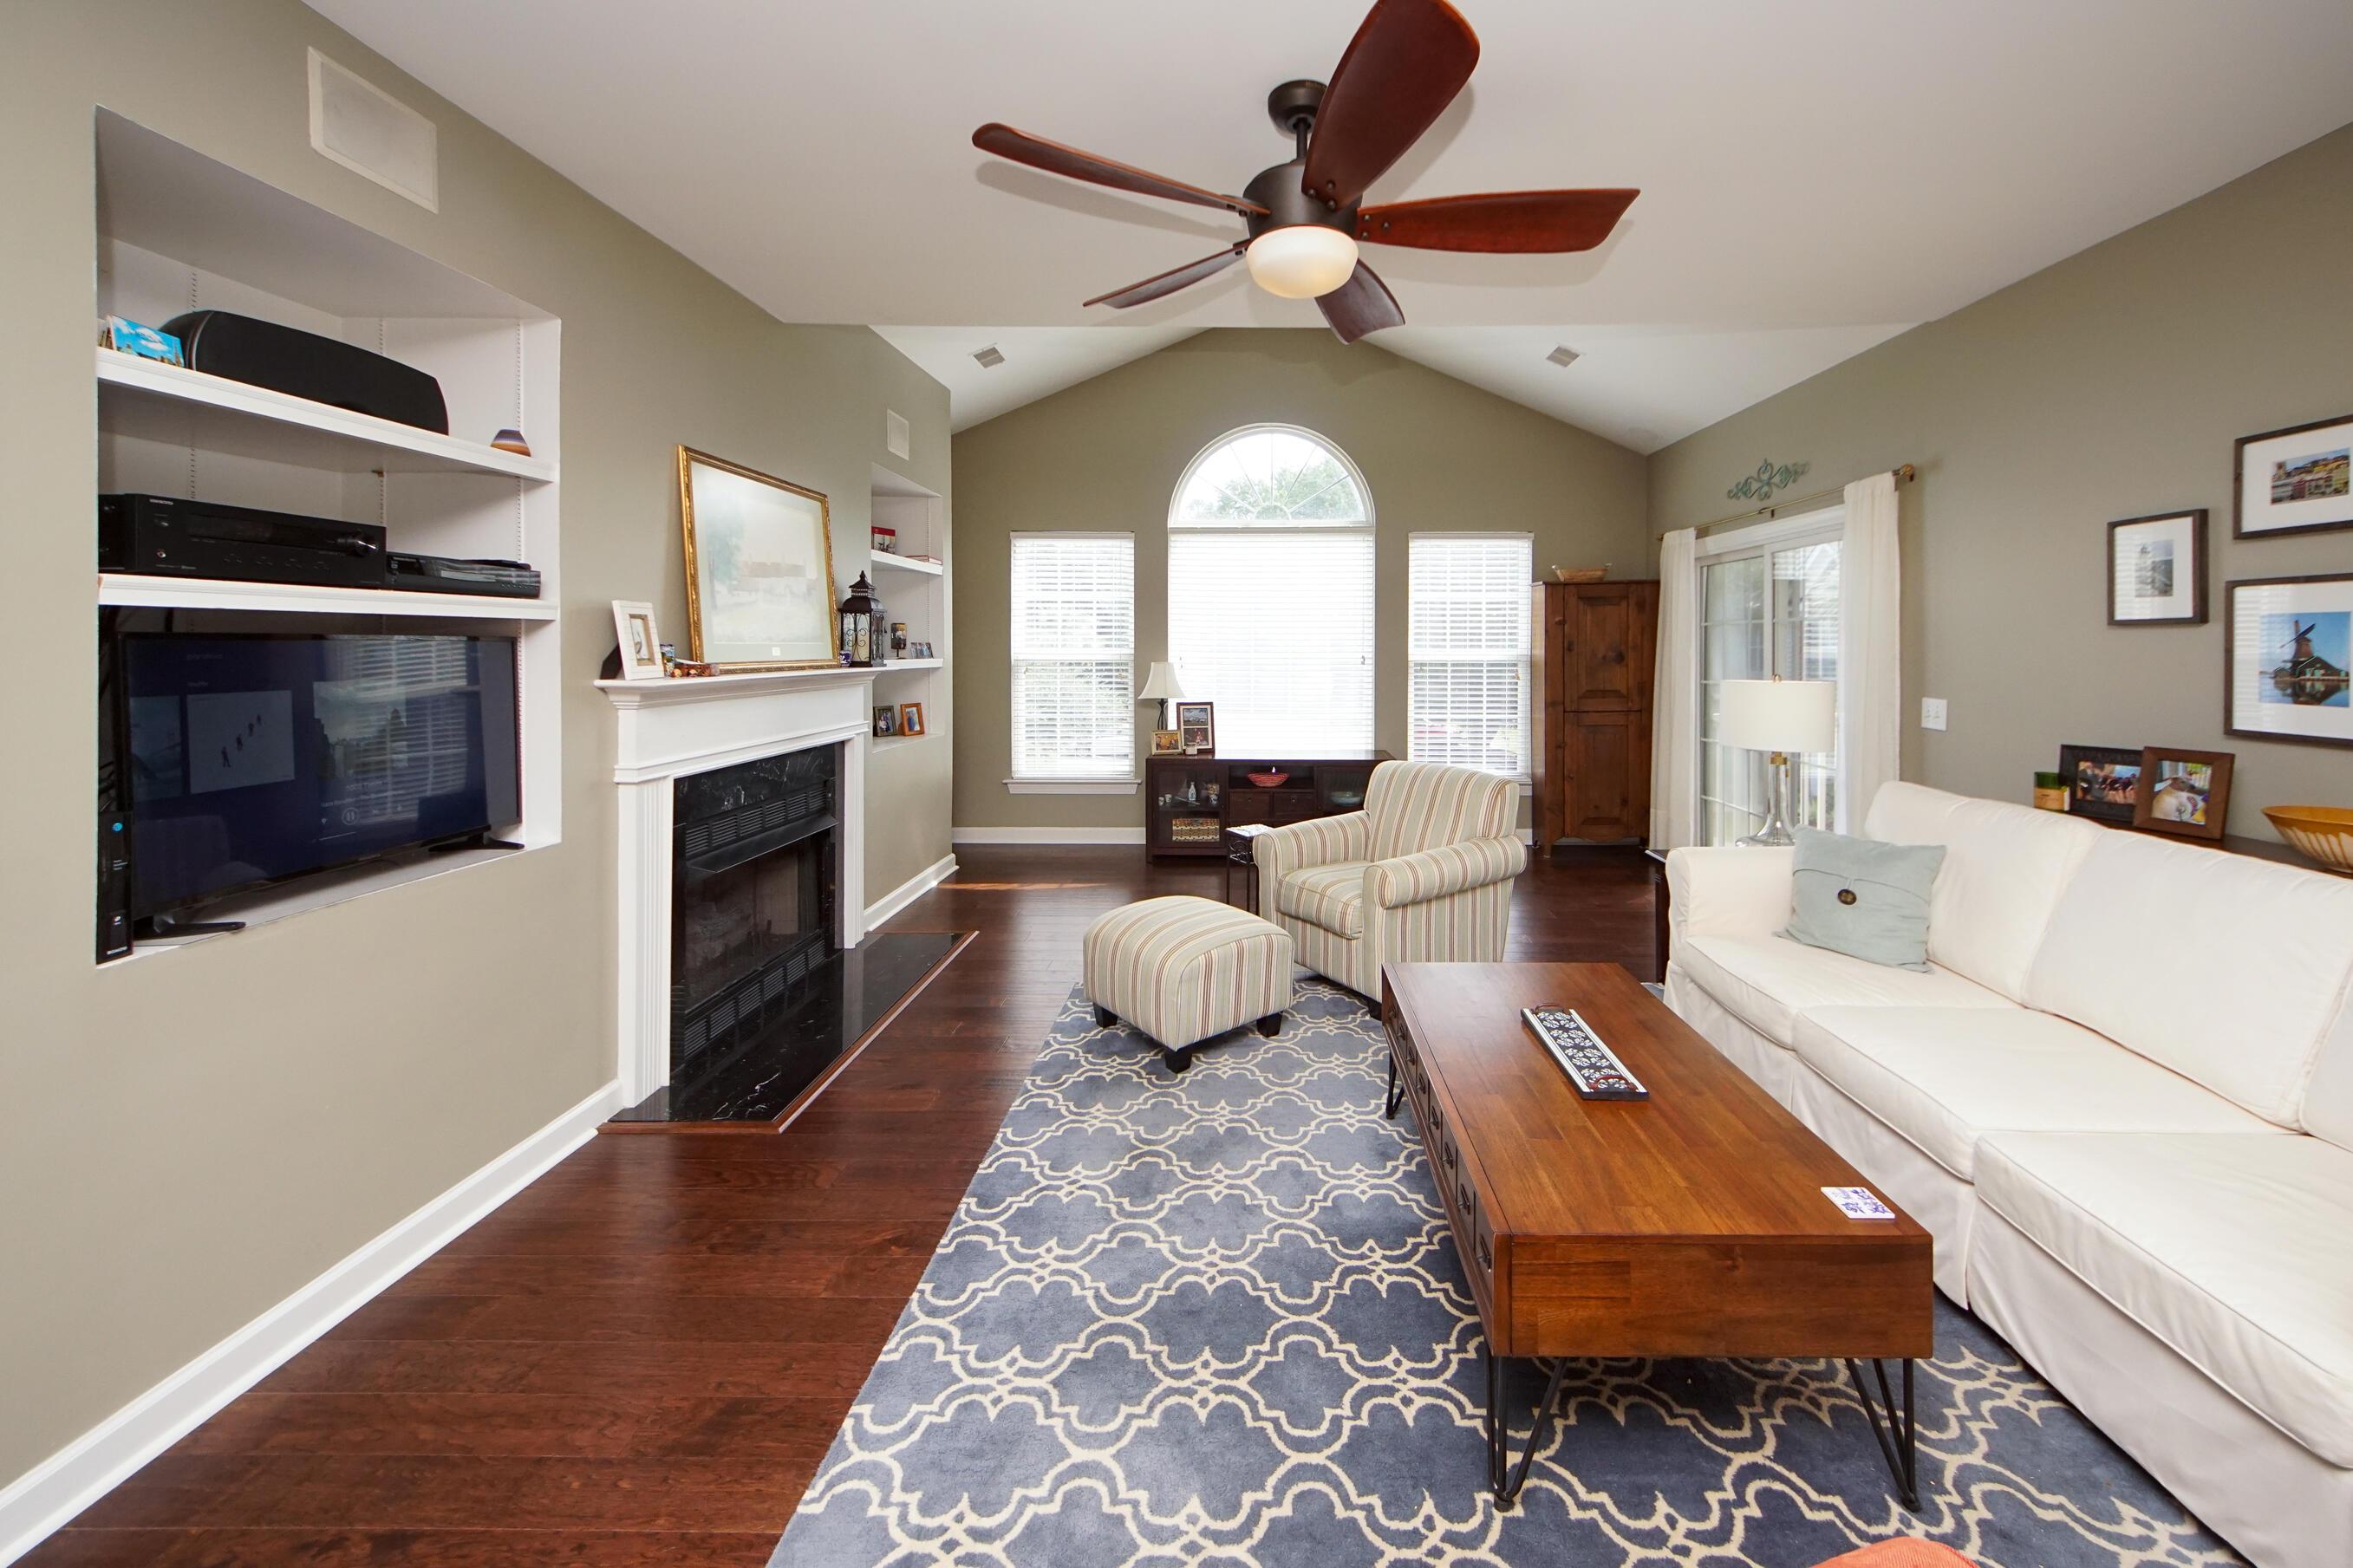 Dunes West Homes For Sale - 1631 Camfield, Mount Pleasant, SC - 9